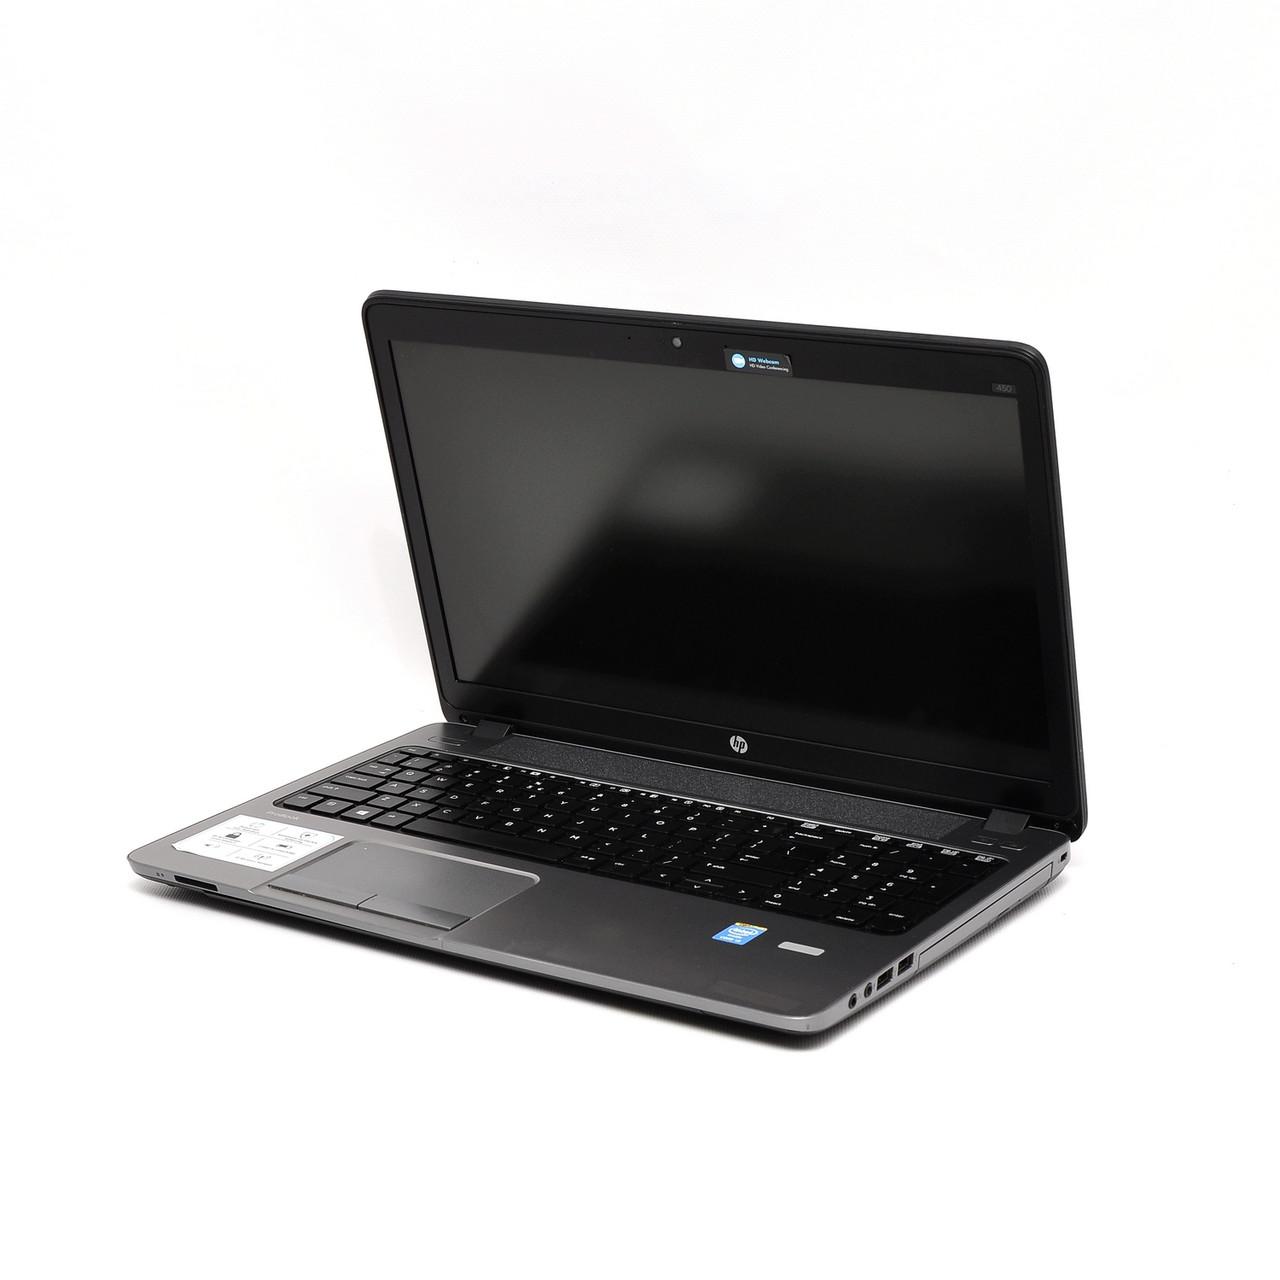 "Б/У Ноутбук    HP ProBook 450 G1 / 15.6"" / Intel Core i3-4000M / 8 RAM / 500 HDD /  Intel HD 4600"